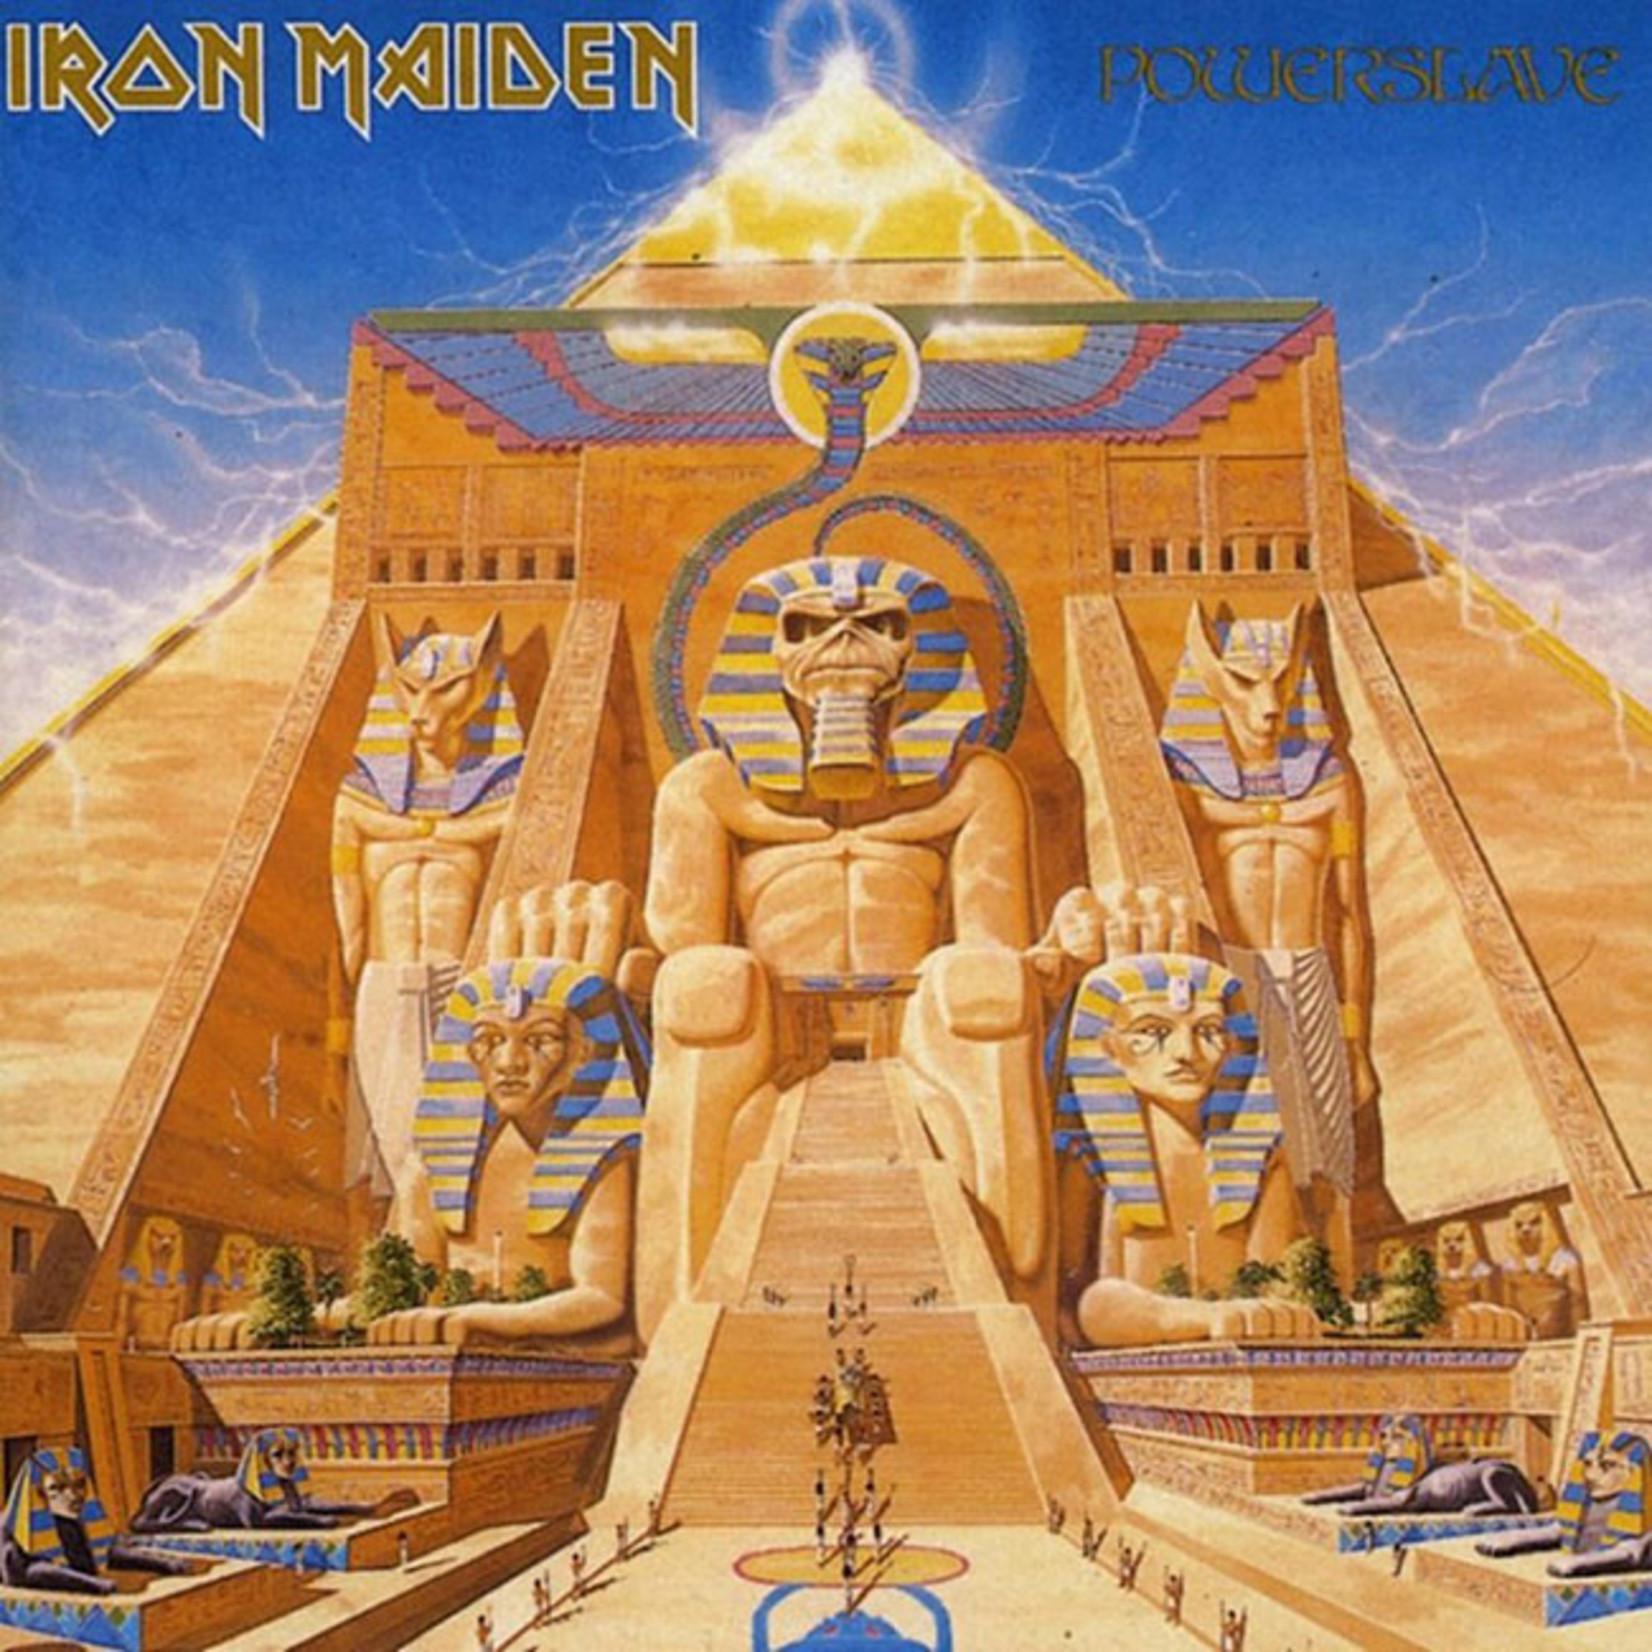 [New] Iron Maiden: Powerslave